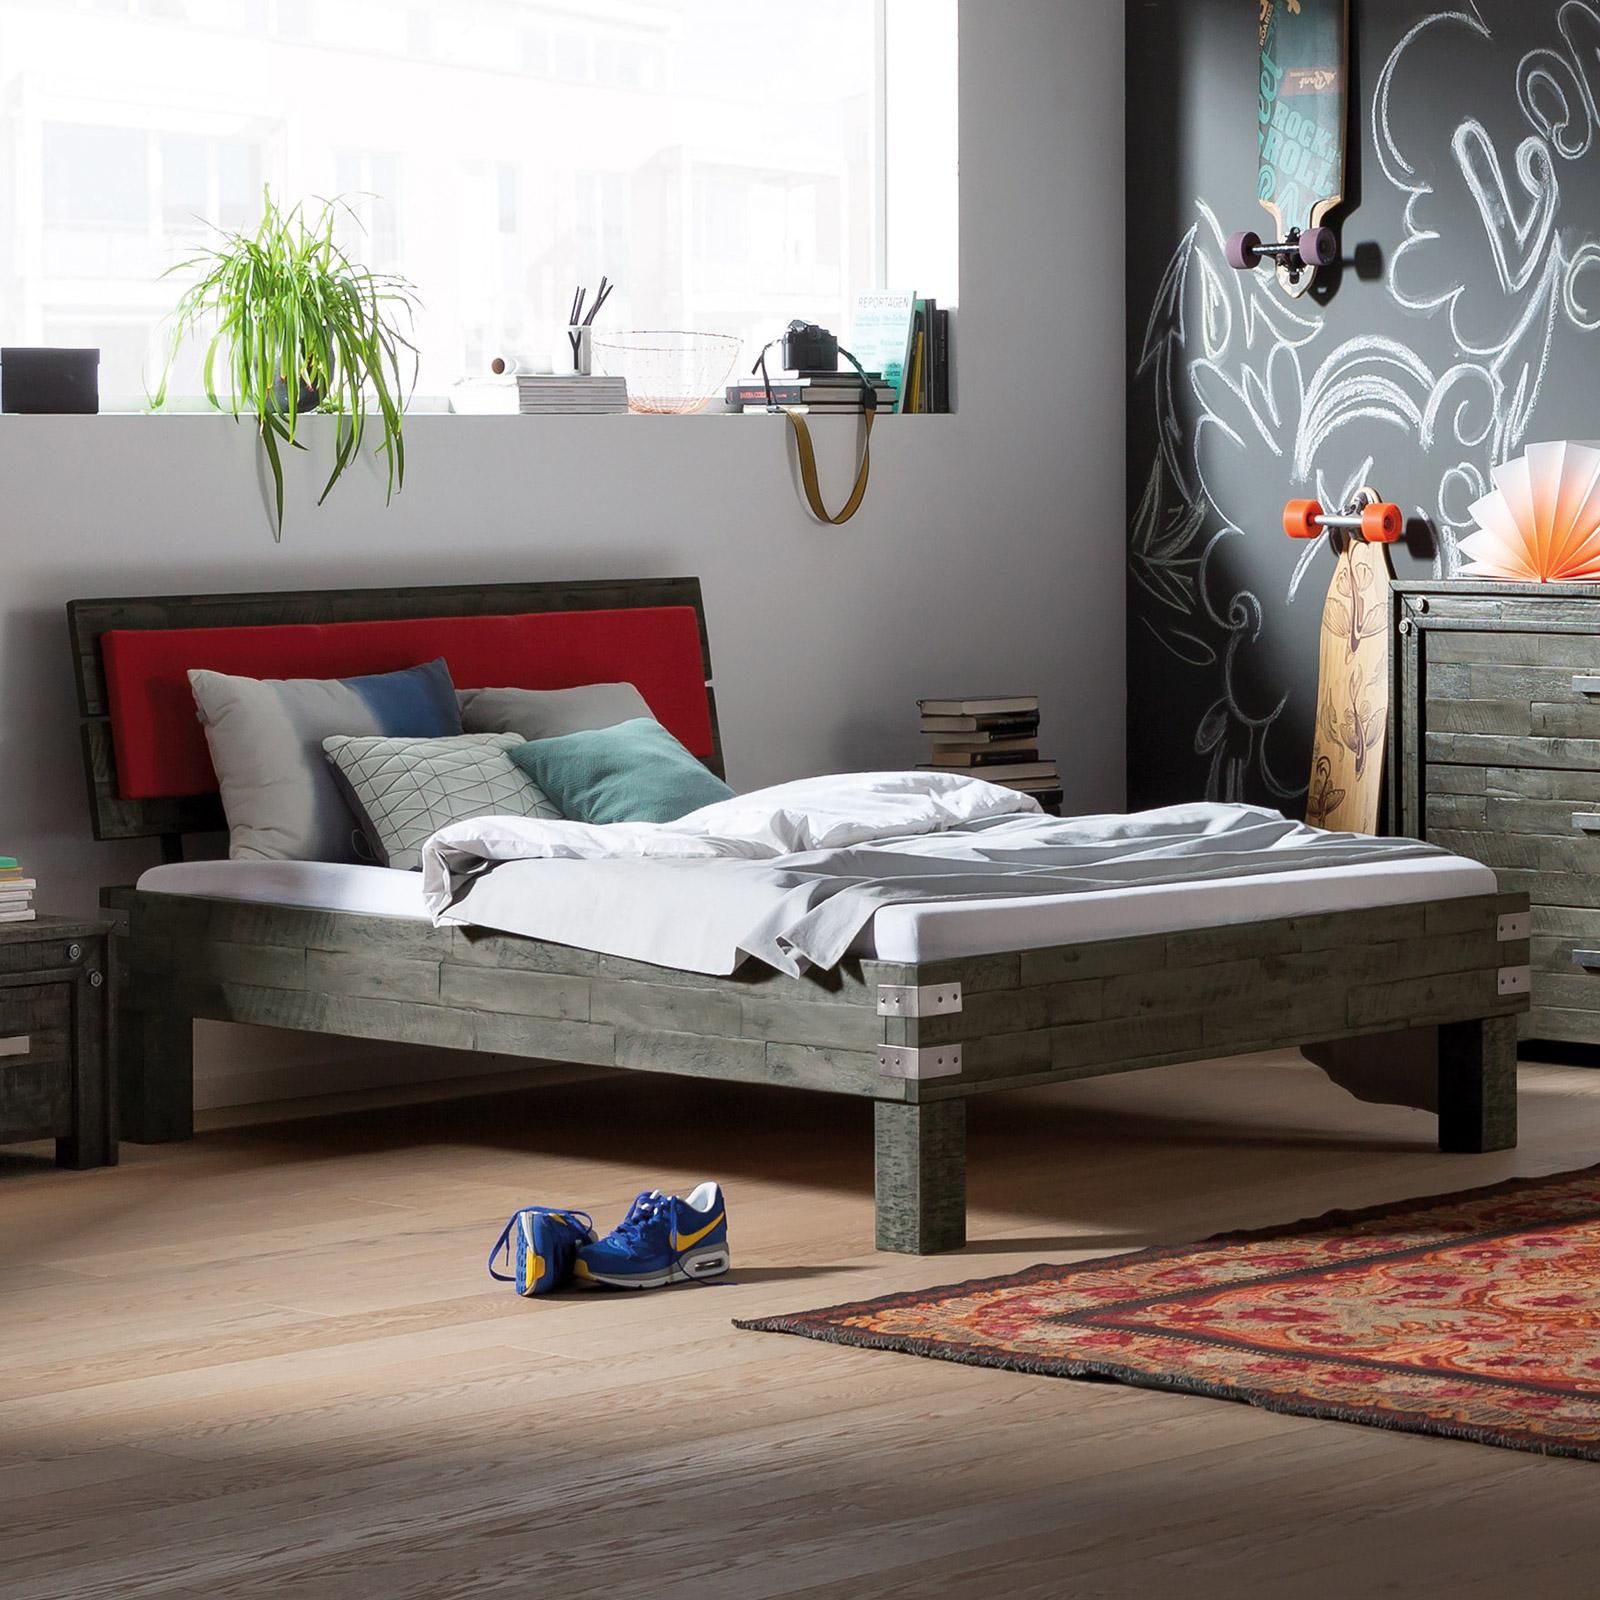 Jugendbett design  Jugendbett aus Akazie im Industrial Style - Felipe